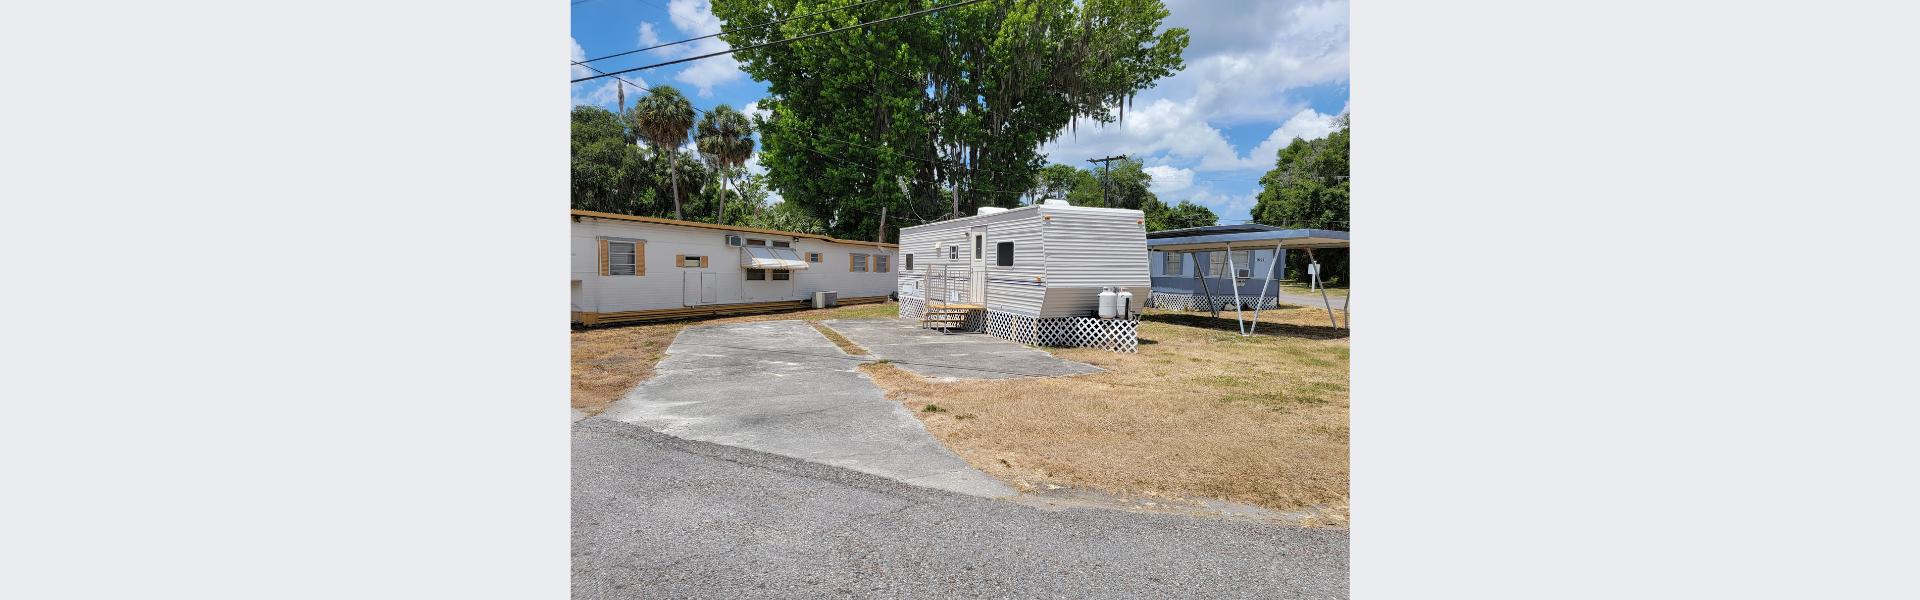 6801 Alafia Dr, Riverview FL, 33578